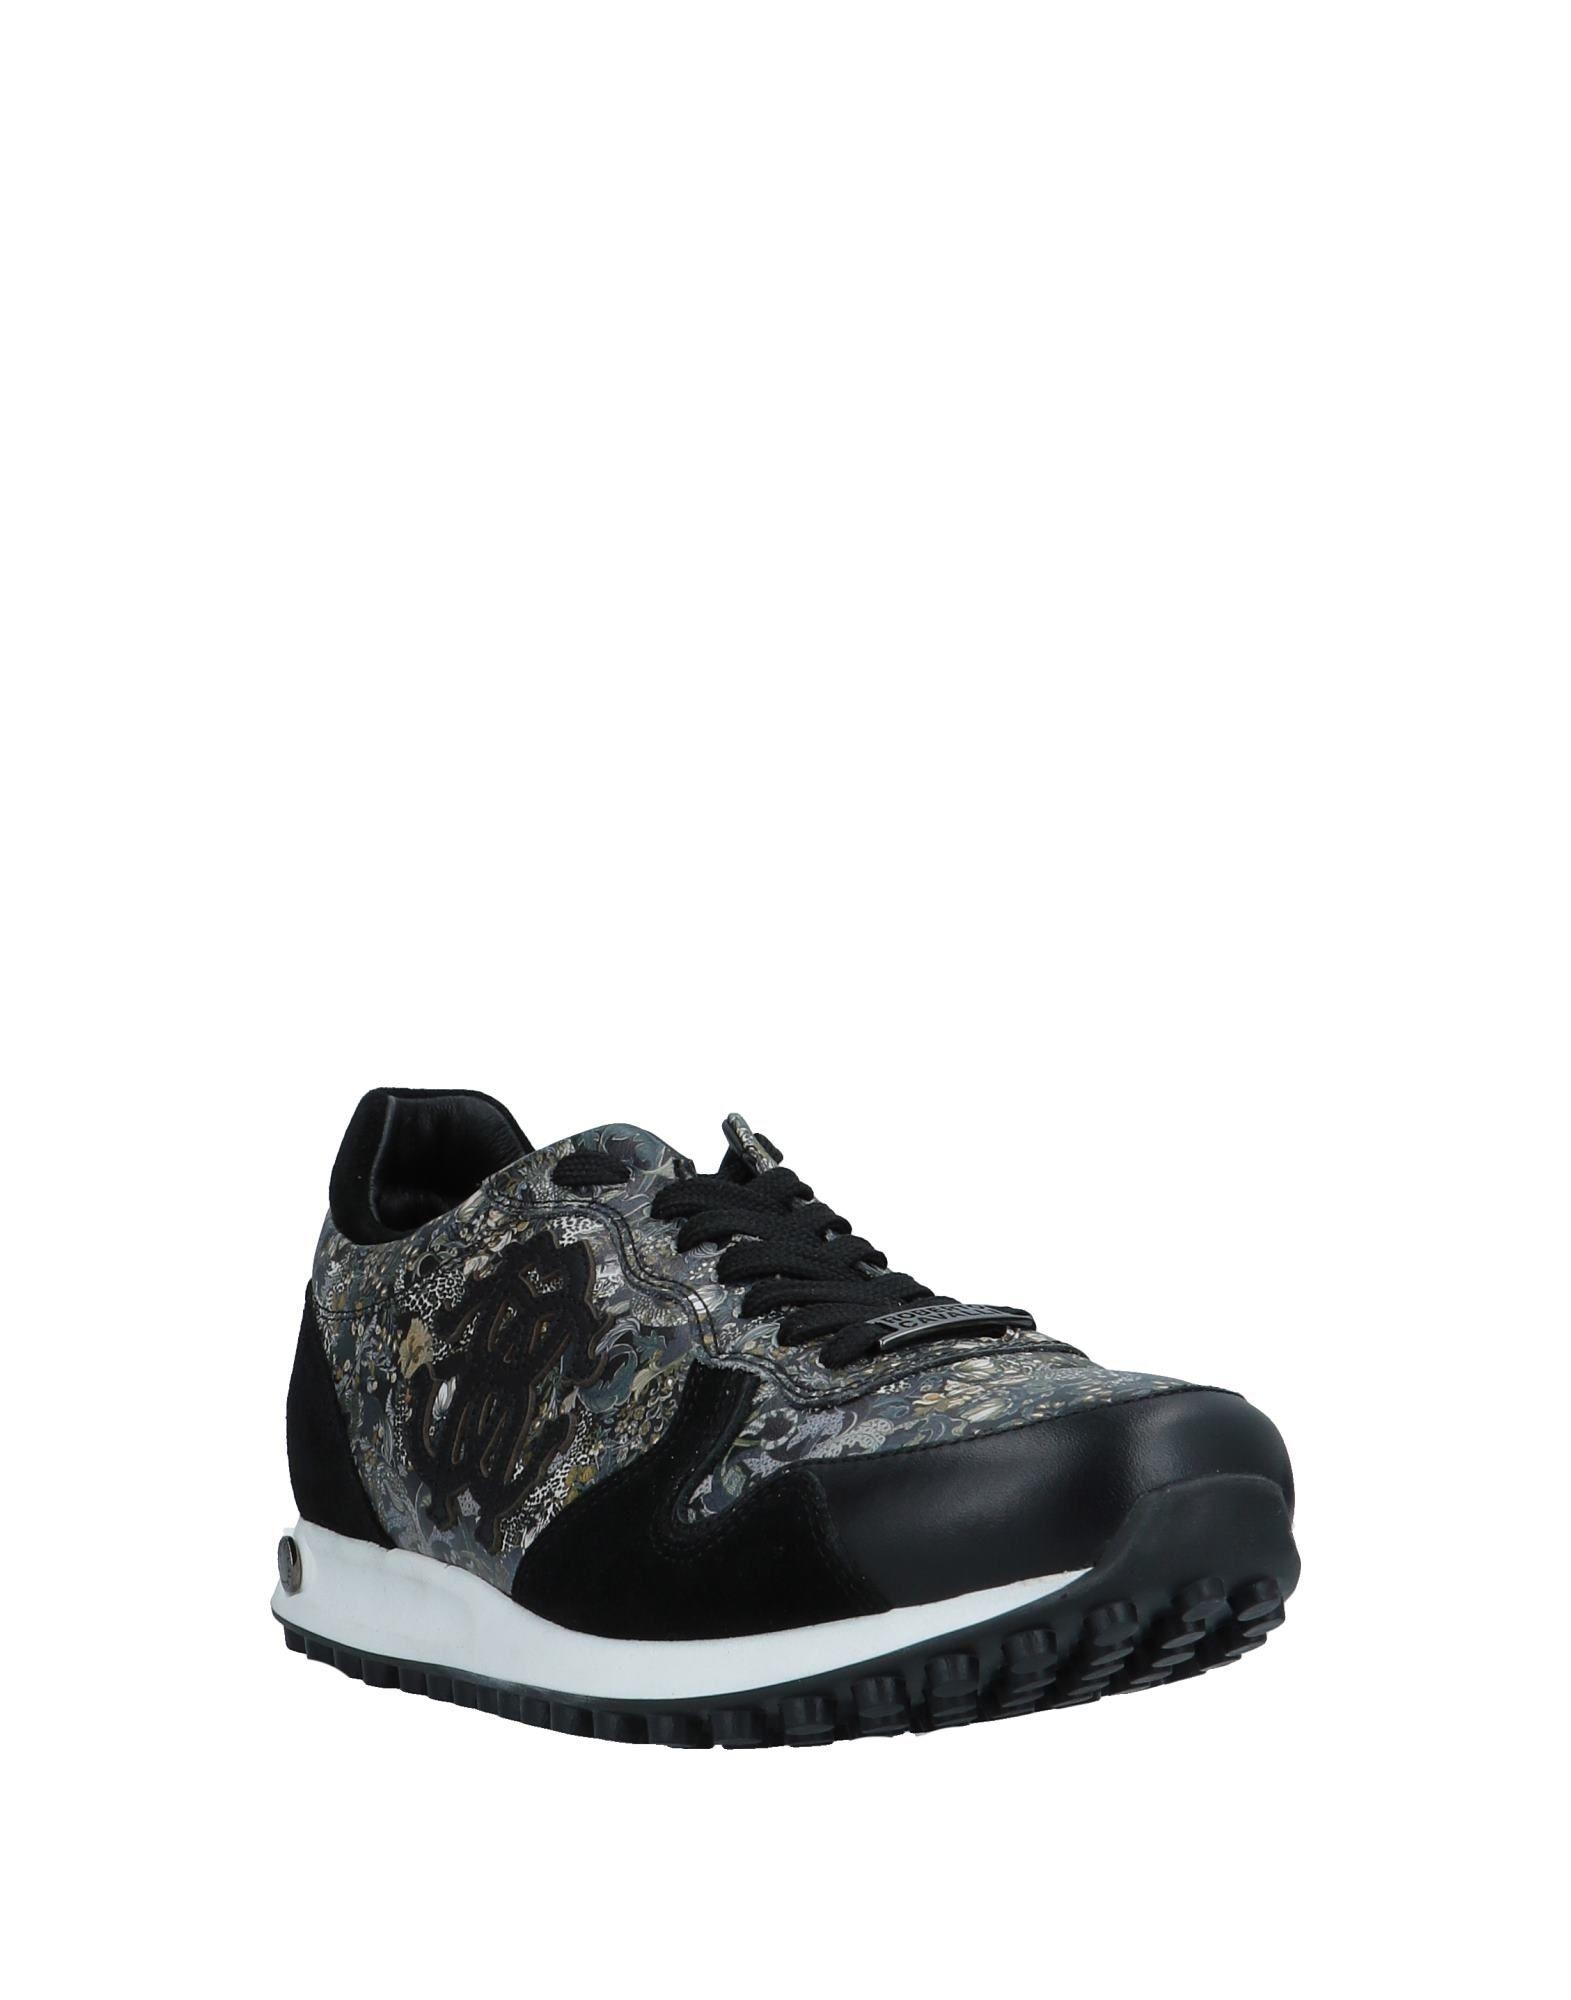 Roberto Roberto Cavalli Sneakers - Men Roberto Roberto Cavalli Sneakers online on  Australia - 11577137PK 493043